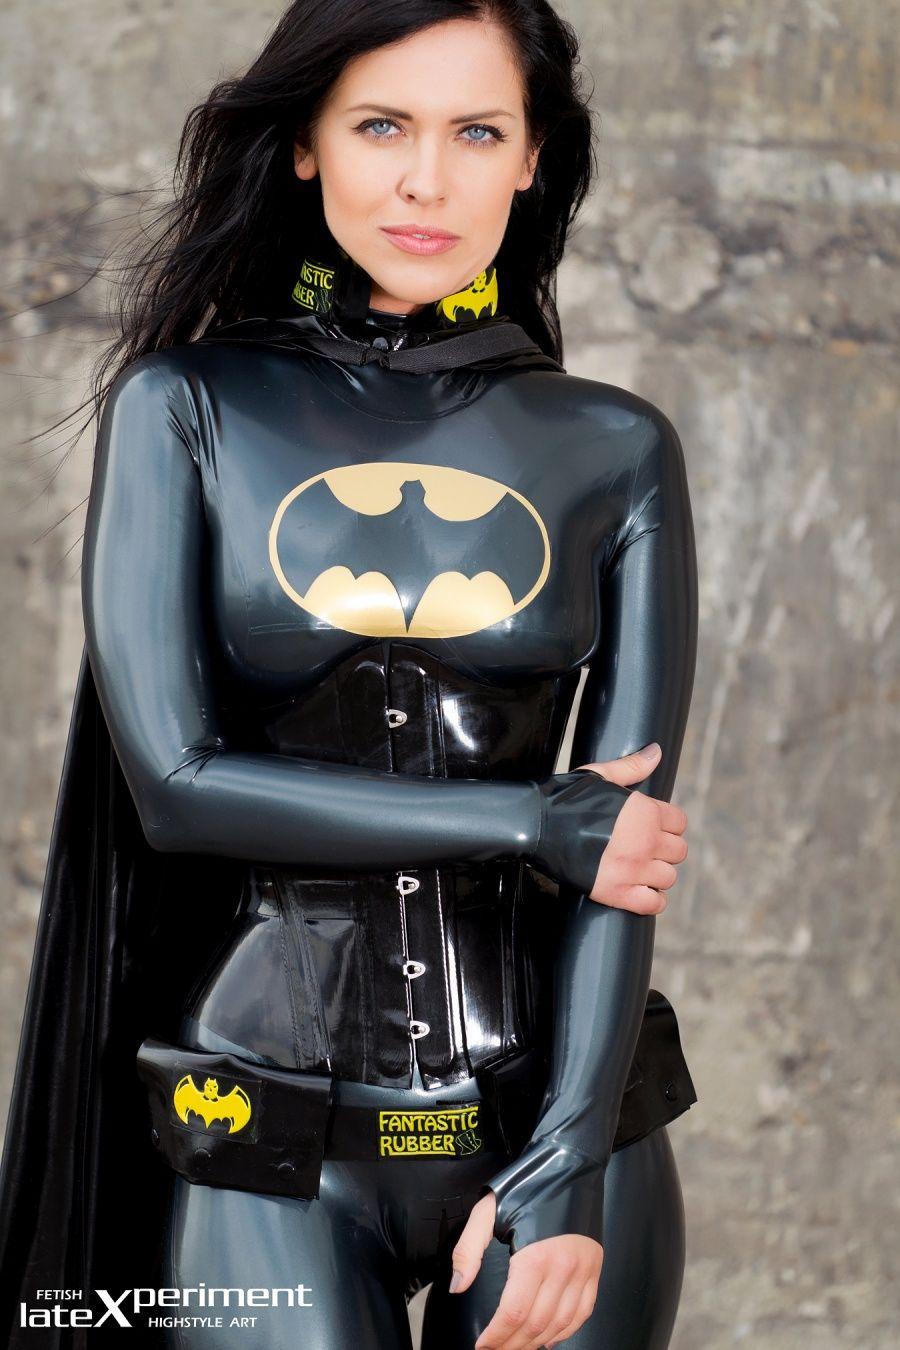 Female Superhero Hentai within ml alexandra corneille ♥ batgirl costume | batgirl | pinterest